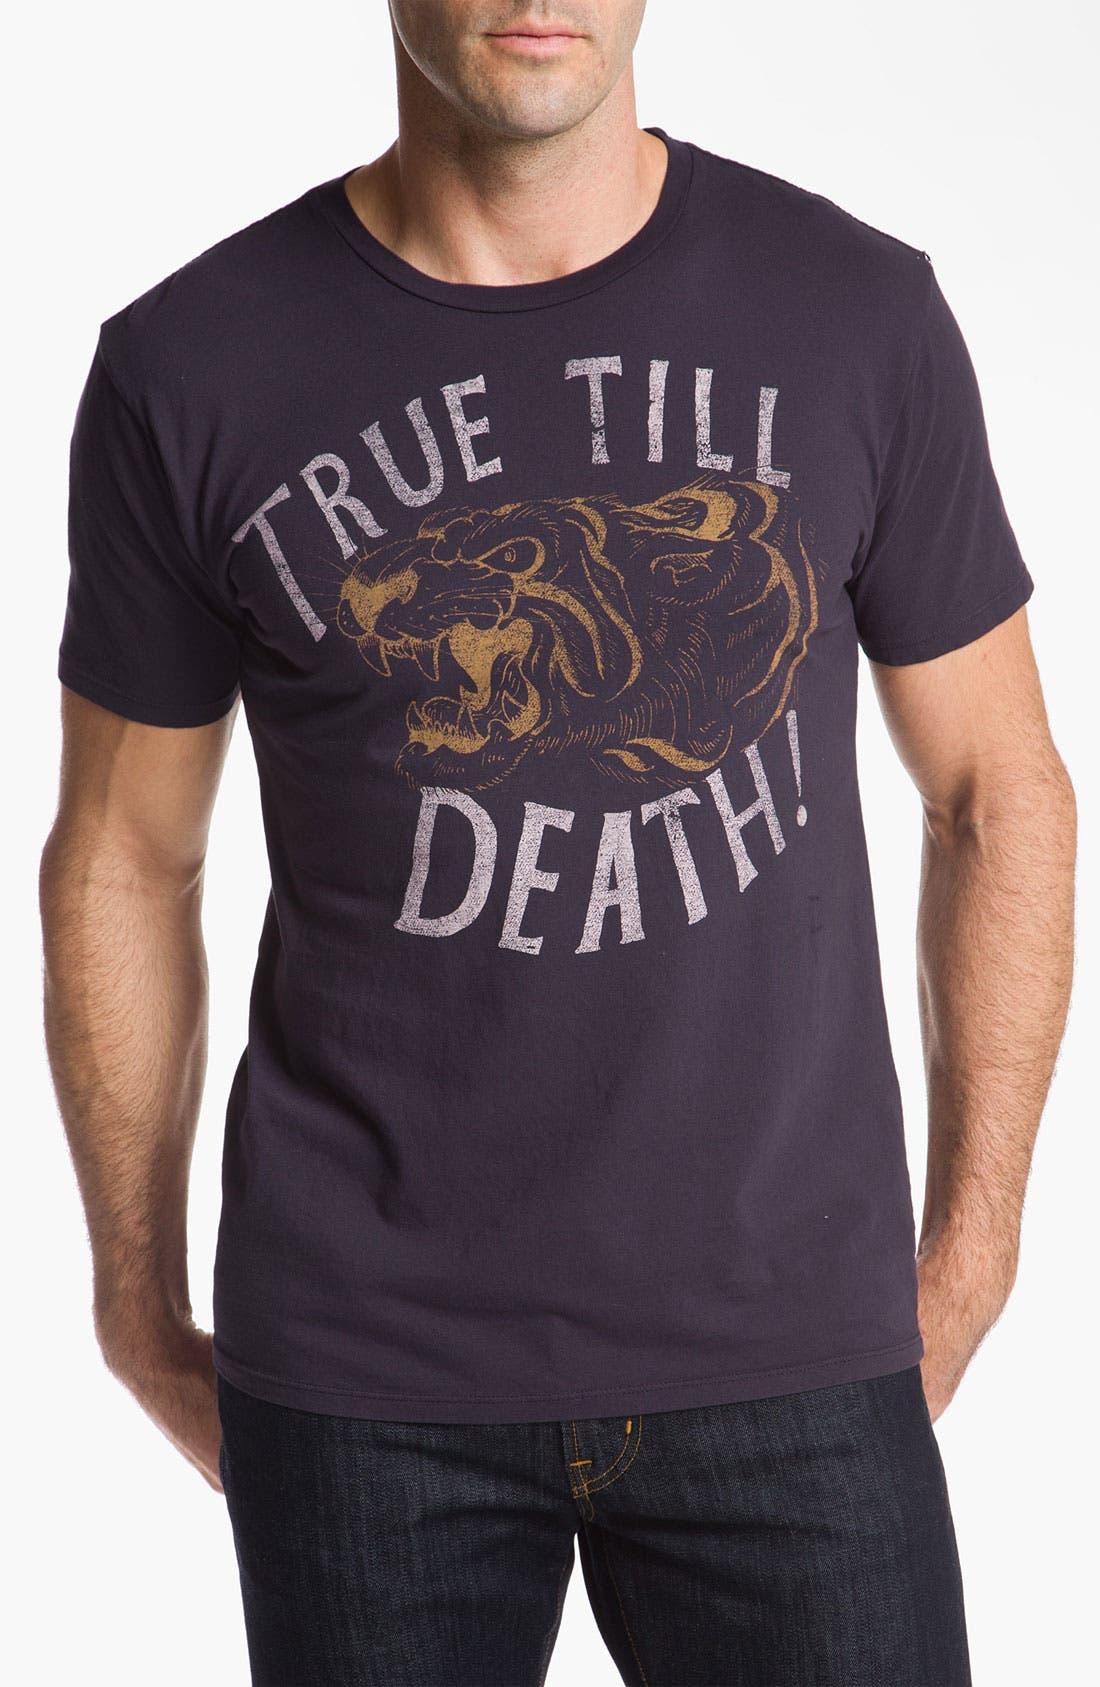 Alternate Image 1 Selected - CXXVI 'True 'Till Death' T-Shirt